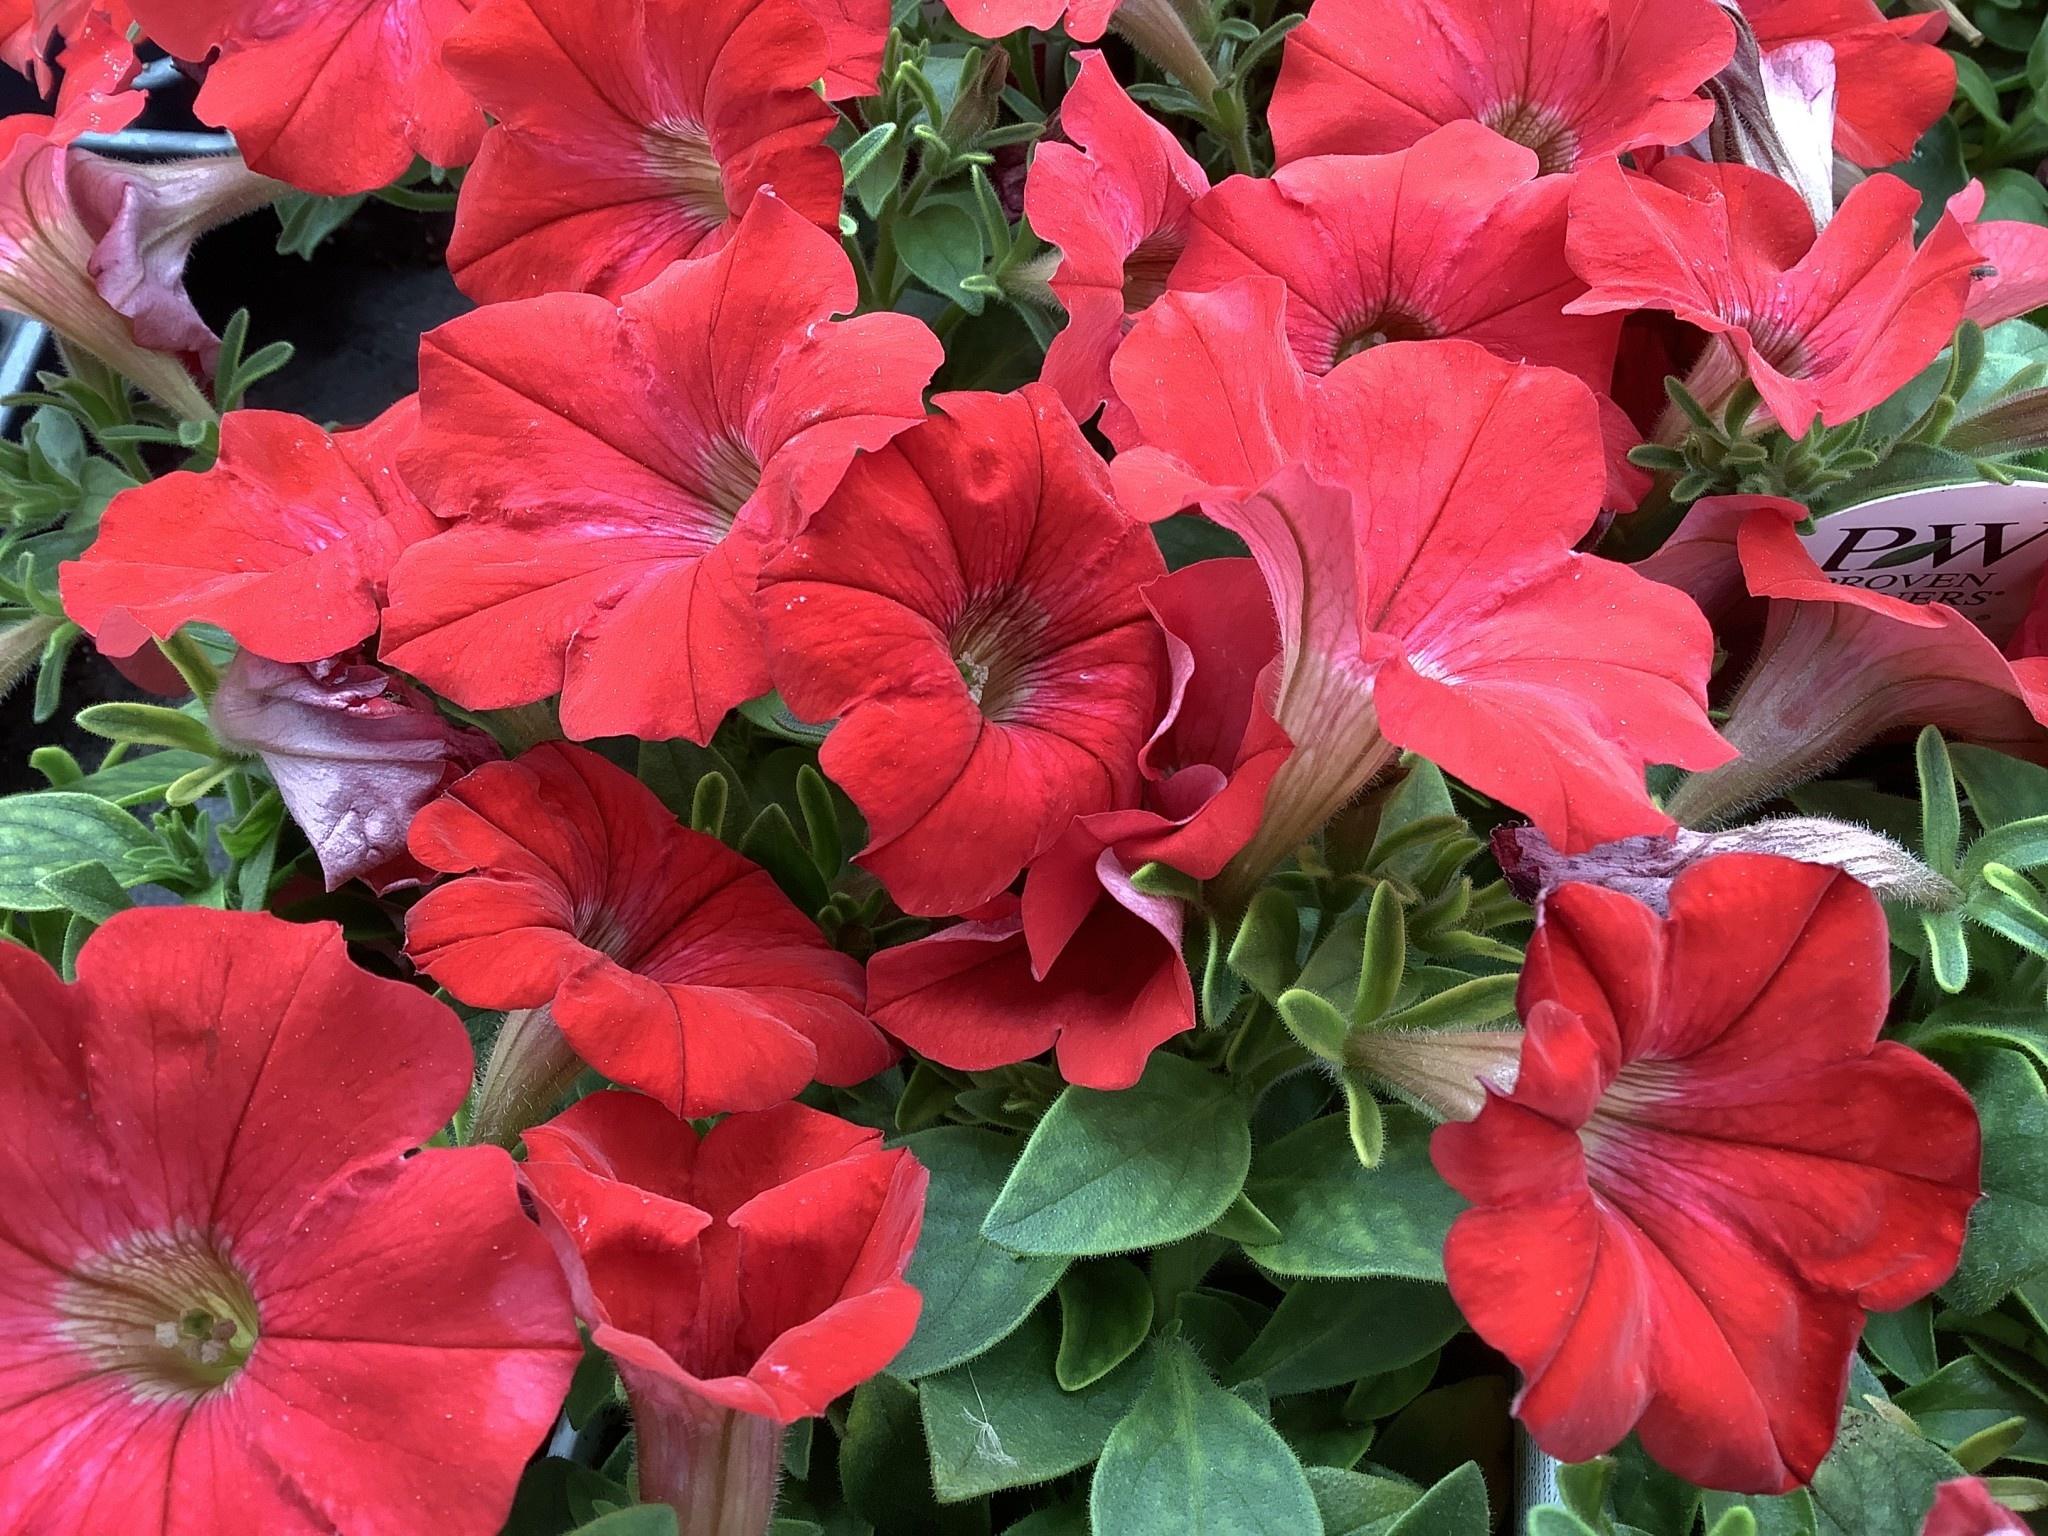 "Petunias, Proven Winners Supertunia Red 4.5"" Pot"